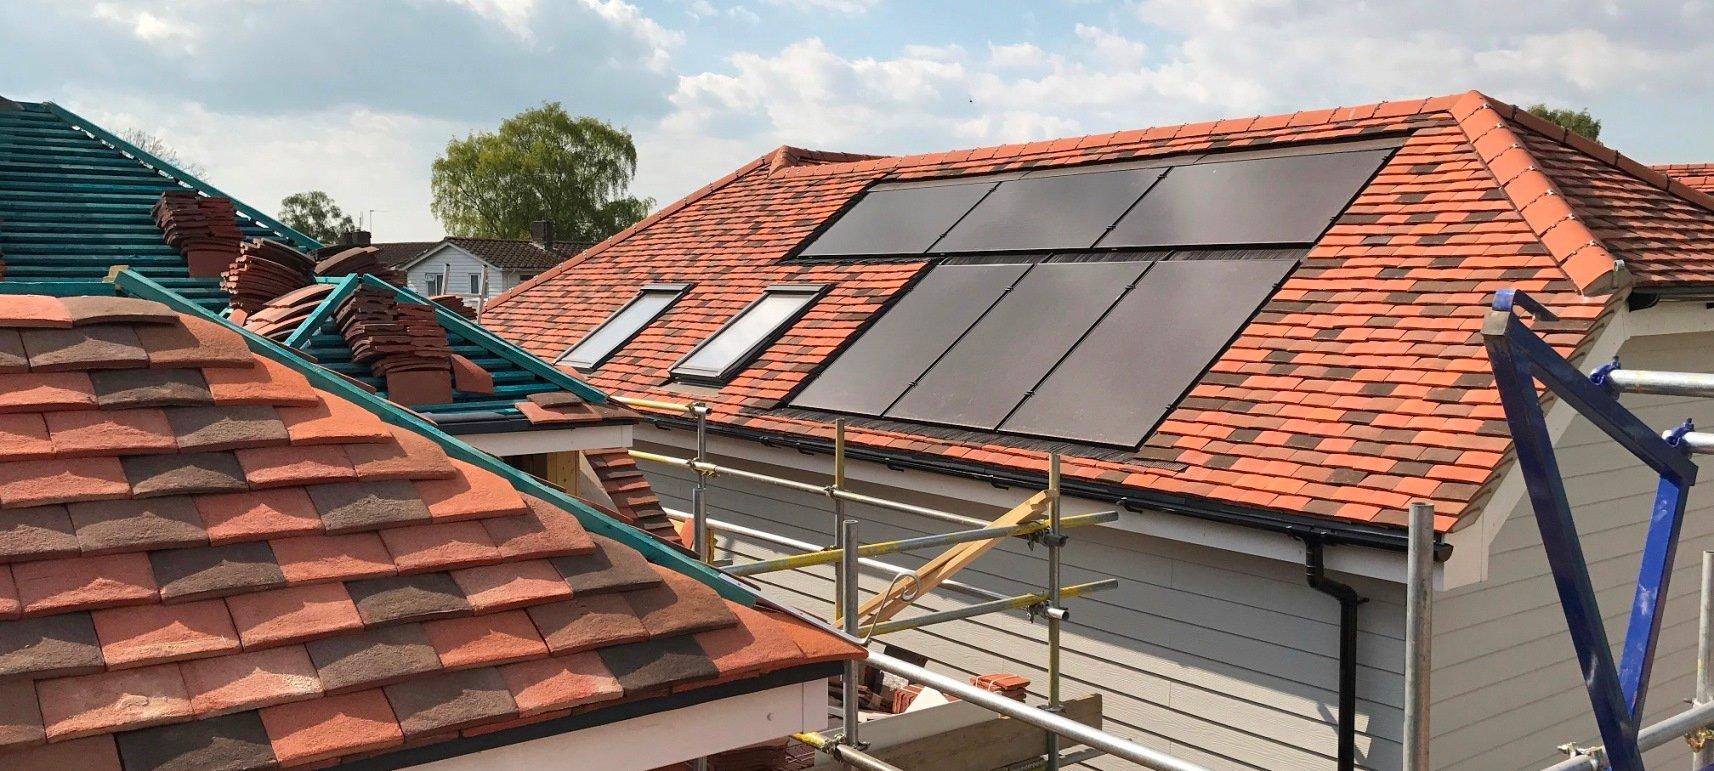 Viridian In Roof Solar